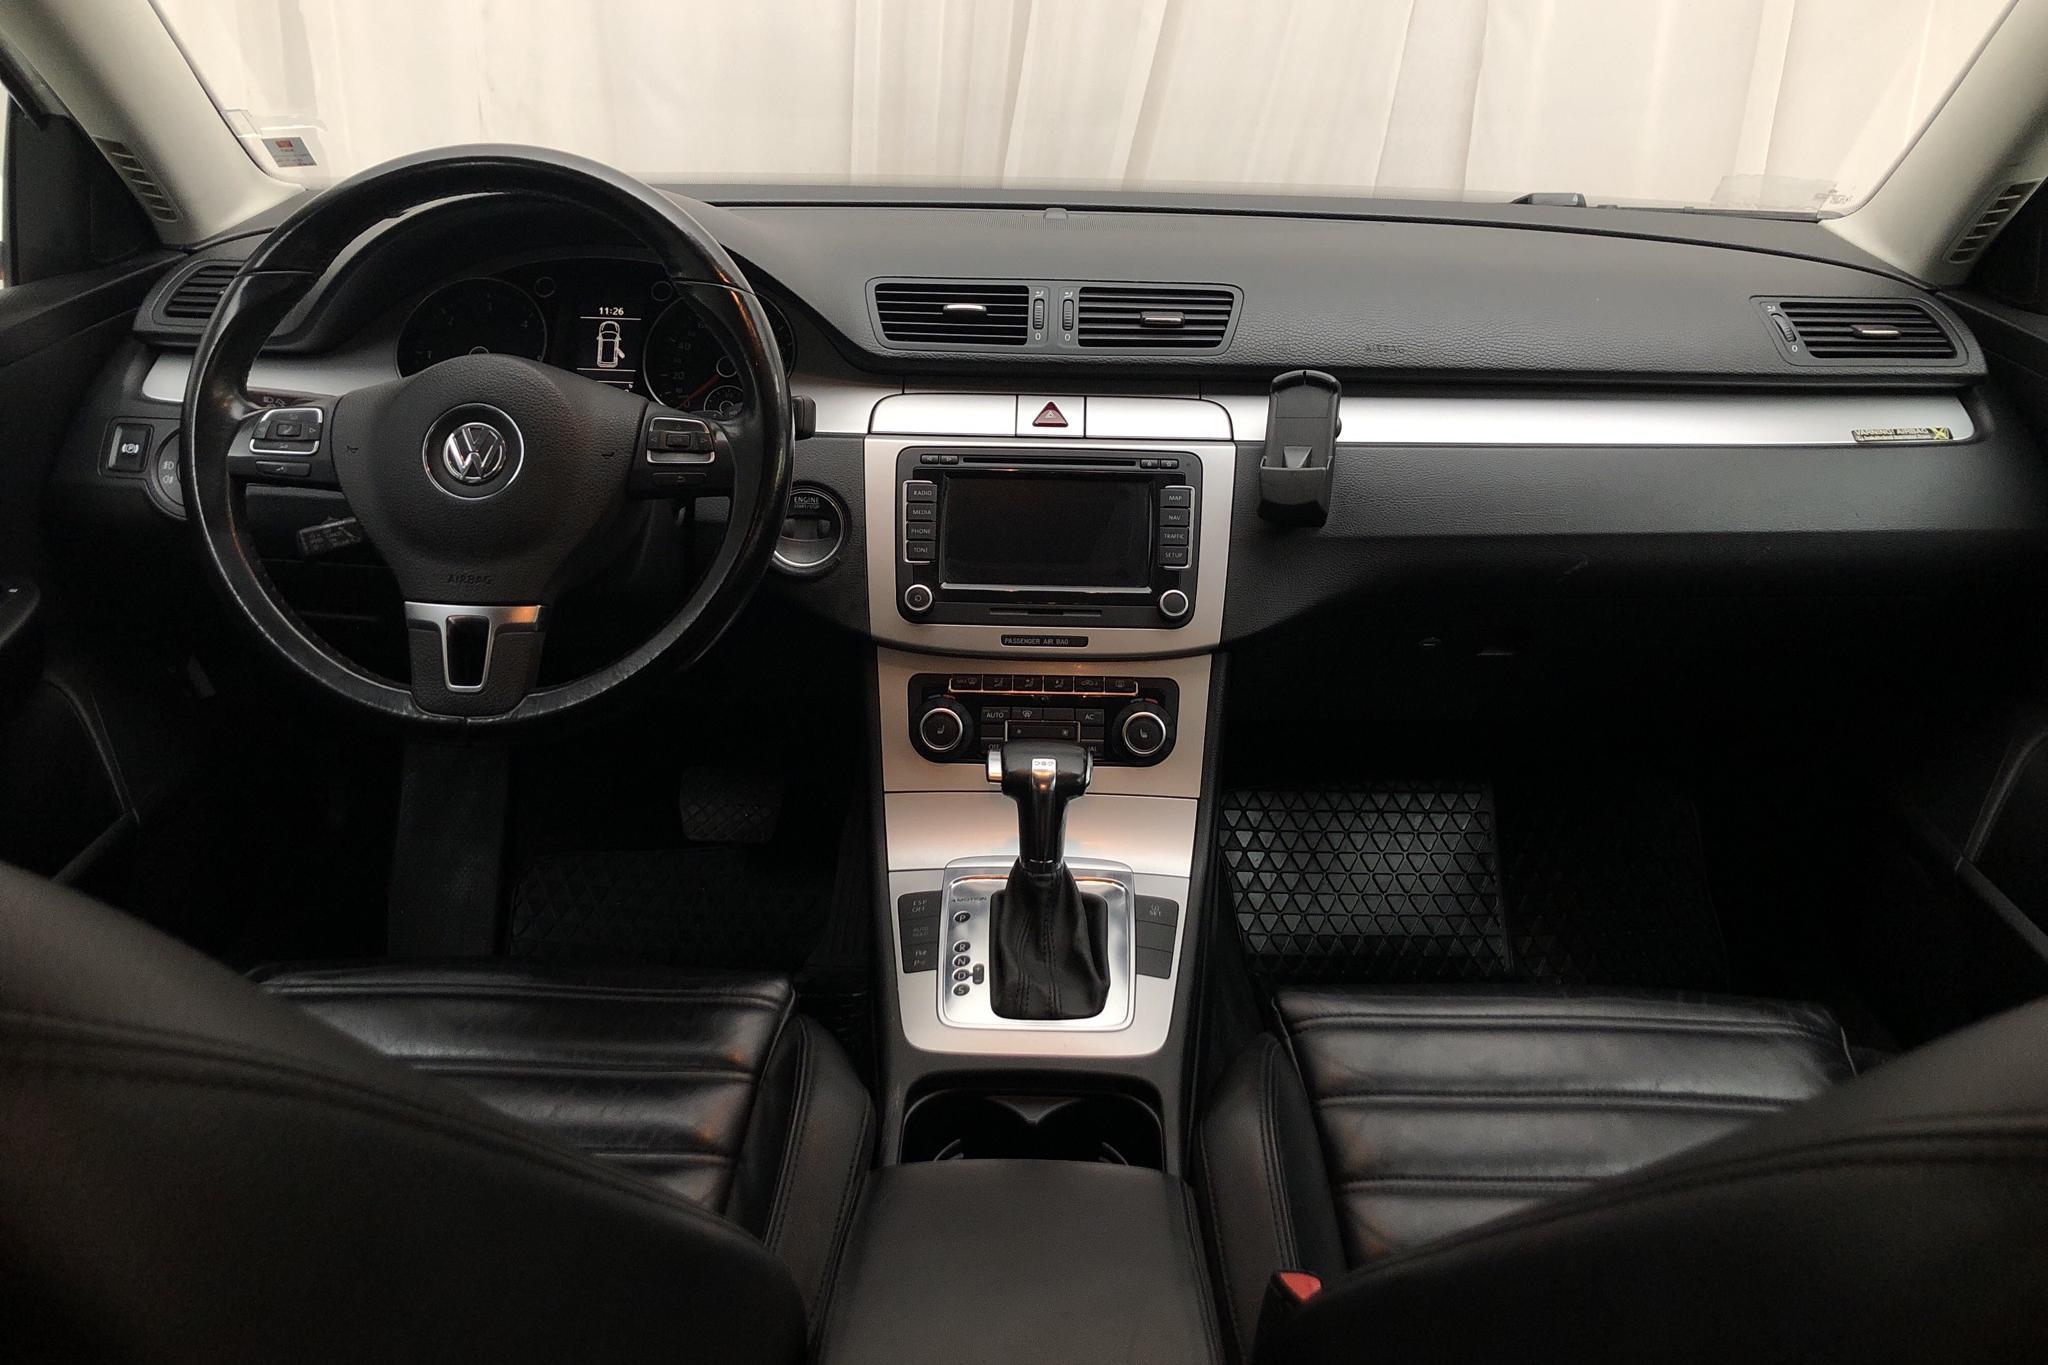 VW Passat 2.0 TDI 4-Motion Variant (170hk) - 292 360 km - Automatic - white - 2010